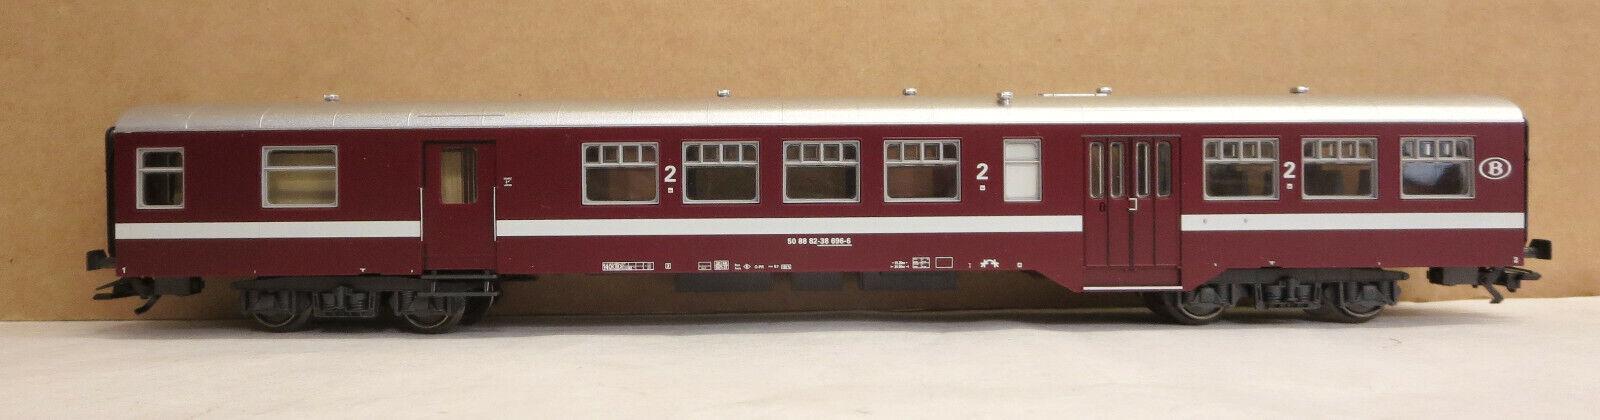 Marklin 43535 Belgian Passenger Car 50 88 82-38 696-6  MIB HO